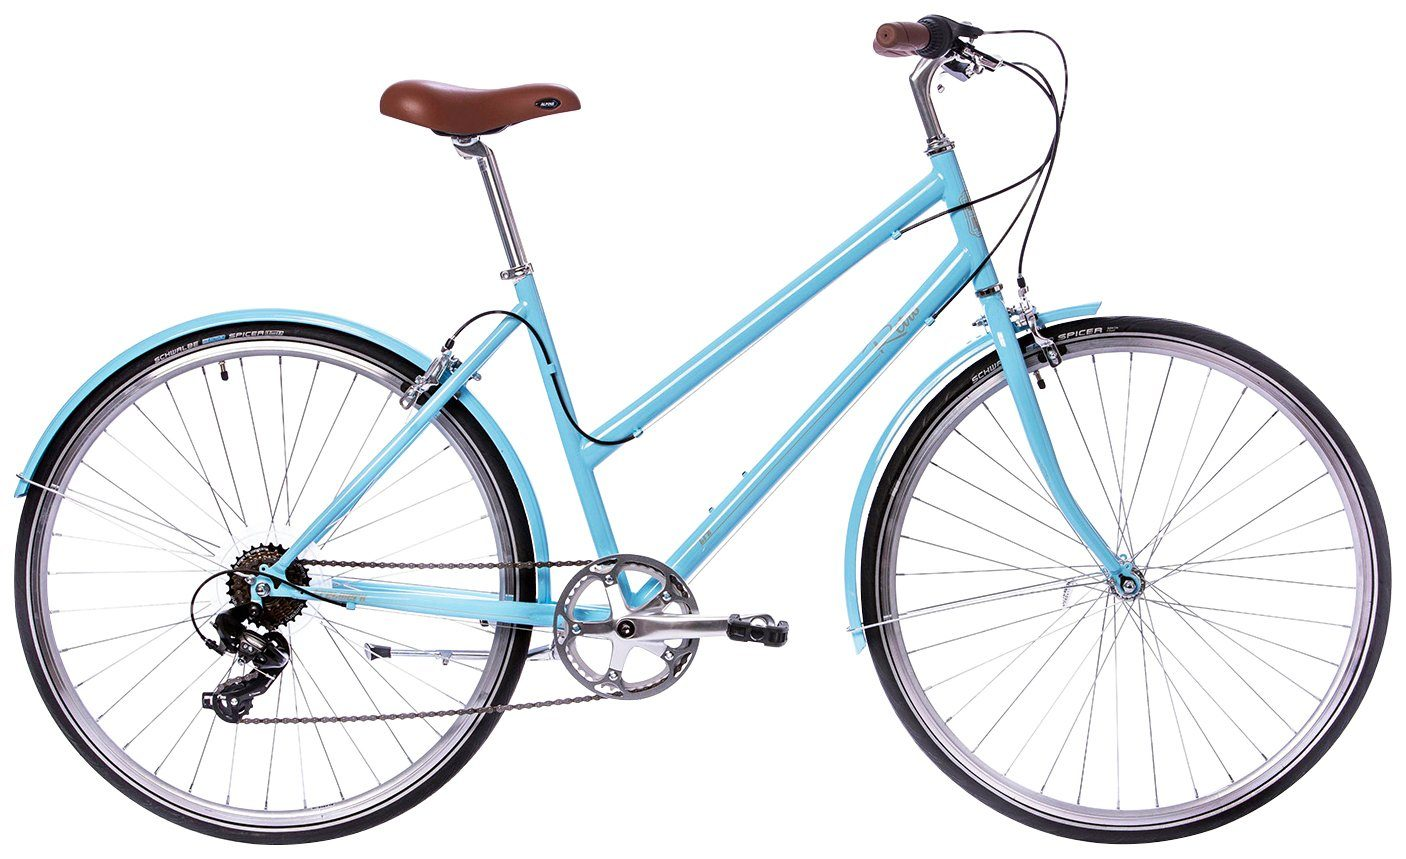 TRETWERK Citybike Damen »Retro«, 28 Zoll, 7 Gang, Felgenbremse